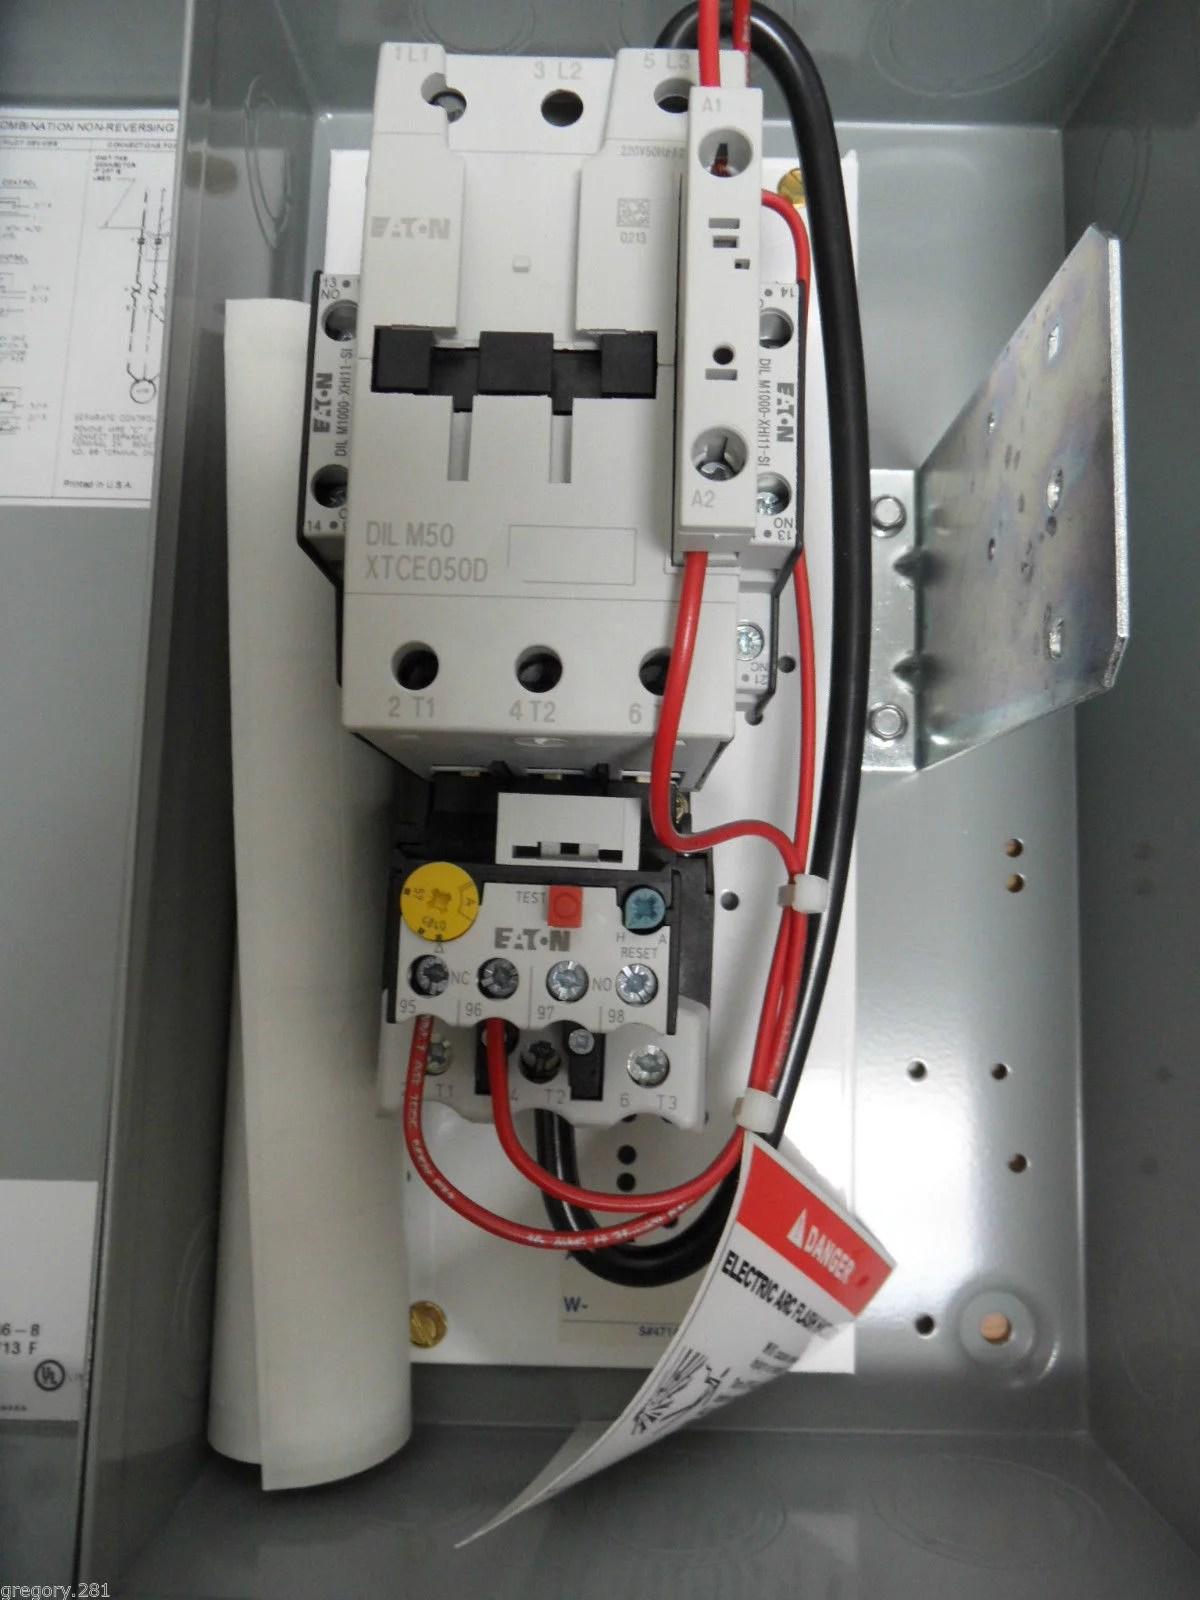 medium resolution of eaton fvnr starter wiring diagram motor soft starter circuitcircuit eaton ecx09k1baa qa27s29 non combination iec fvnr